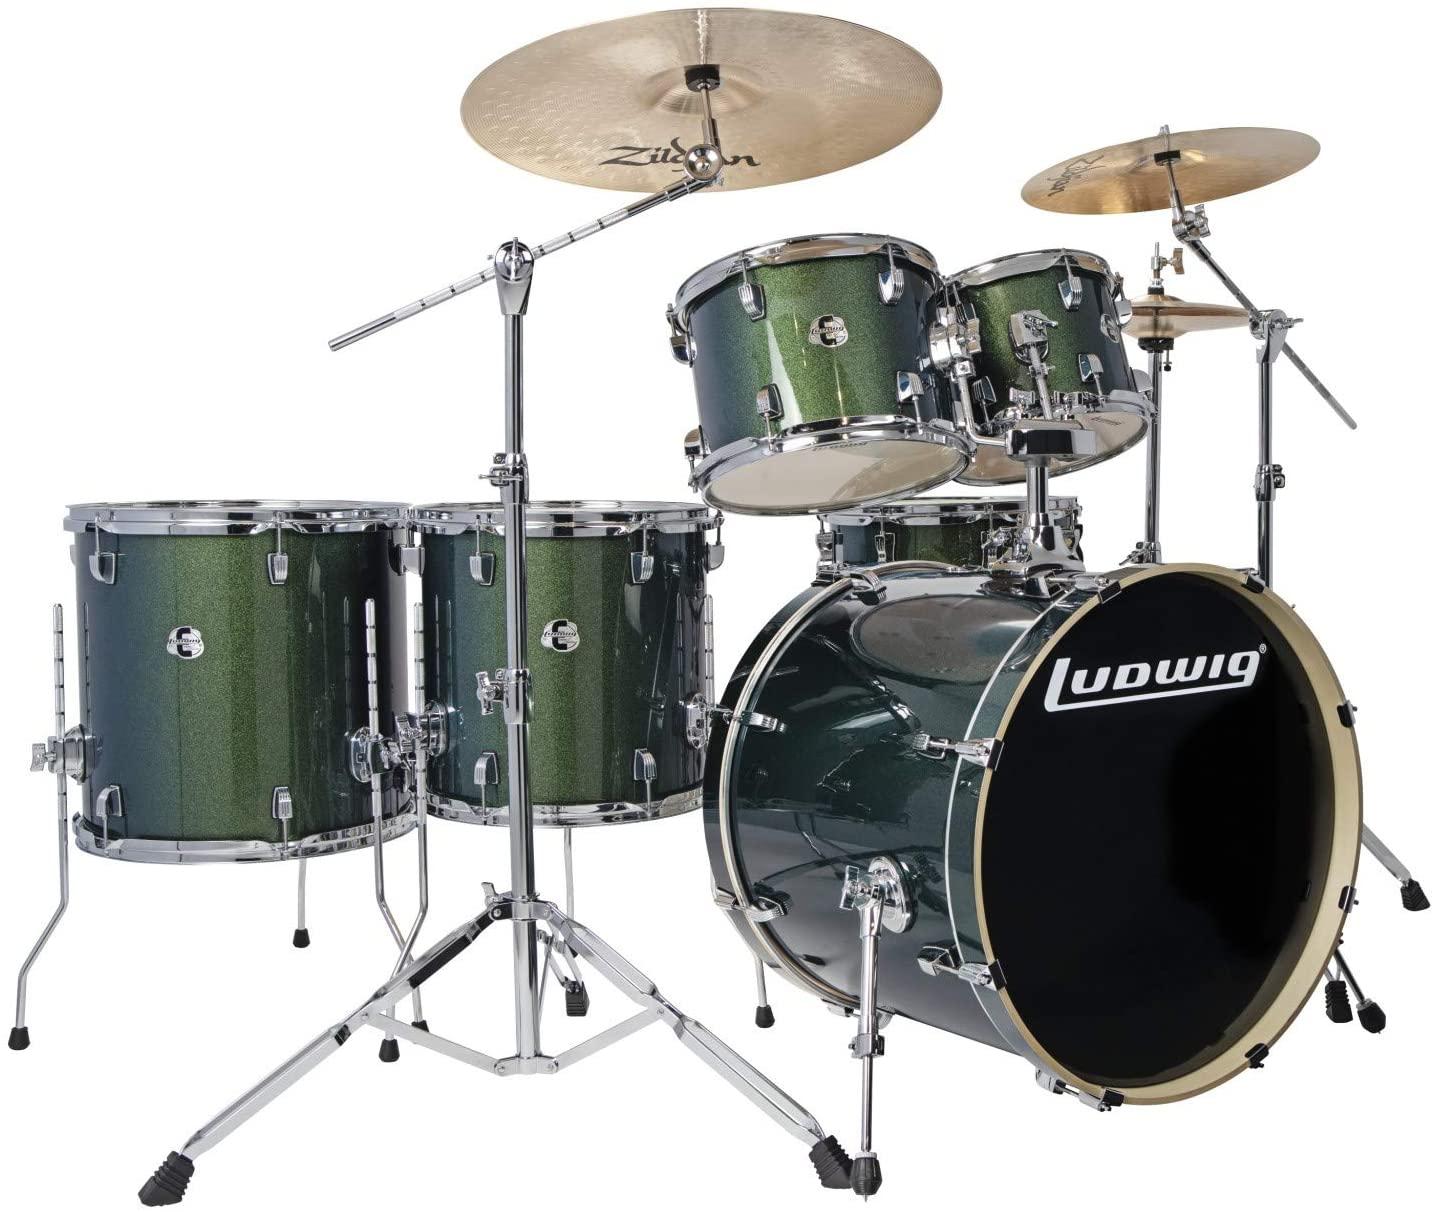 Ludwig Element Evolution 6-piece Complete Drum Set with Zildjian I Cymbals - 22